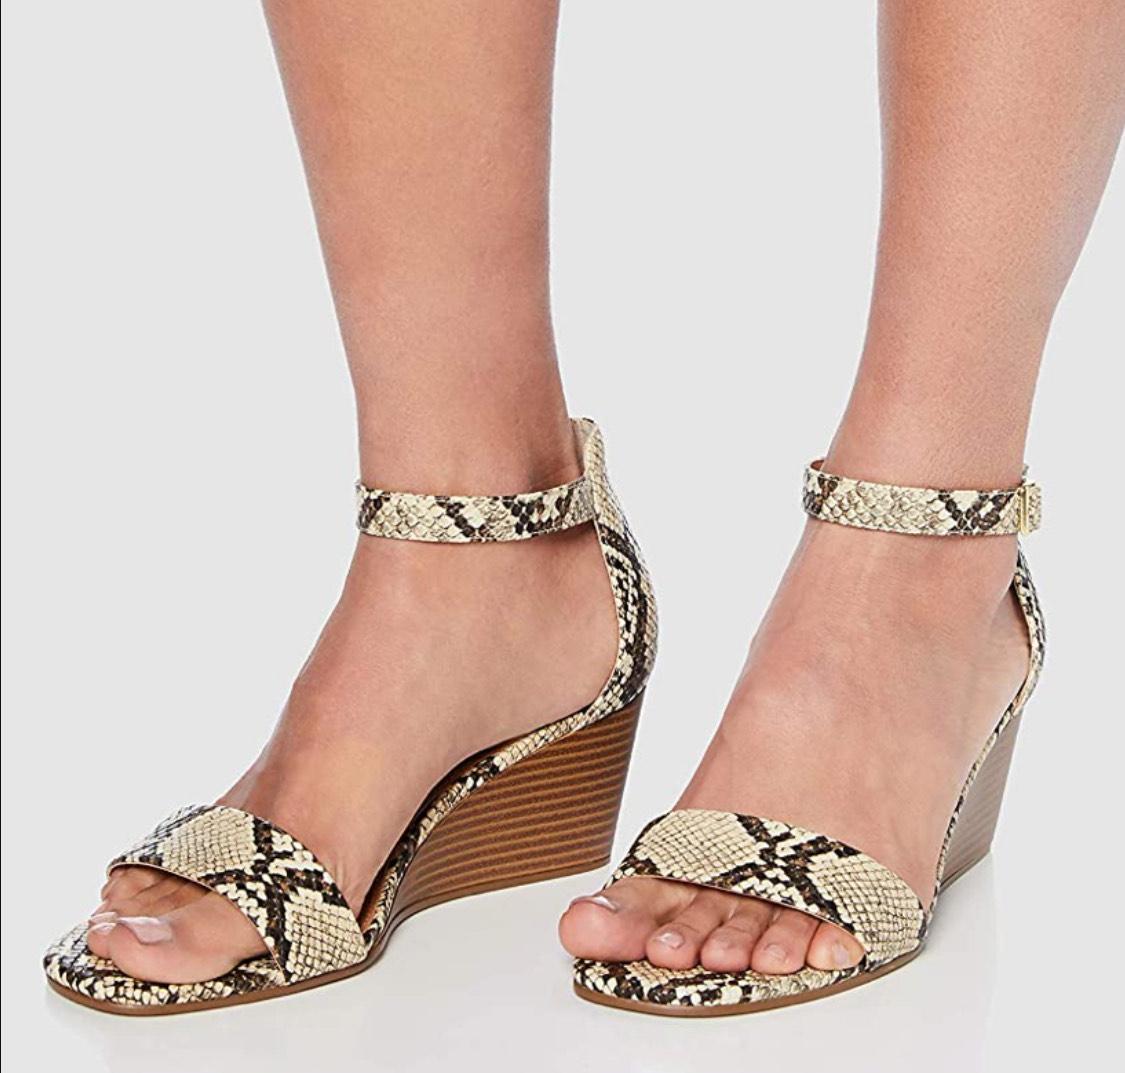 Sandalias con cuña find. mujer talla 41 (37 a 11.23€)